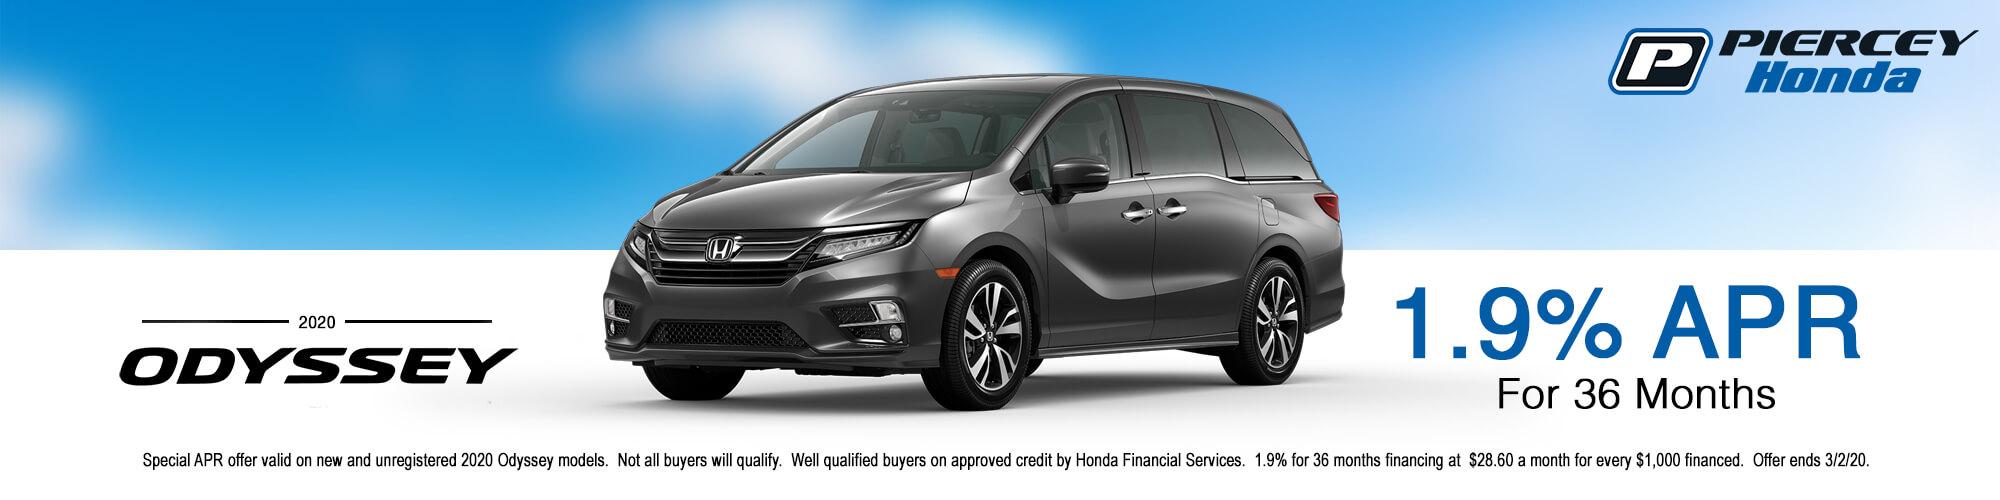 2020 Honda Odyssey APR offer